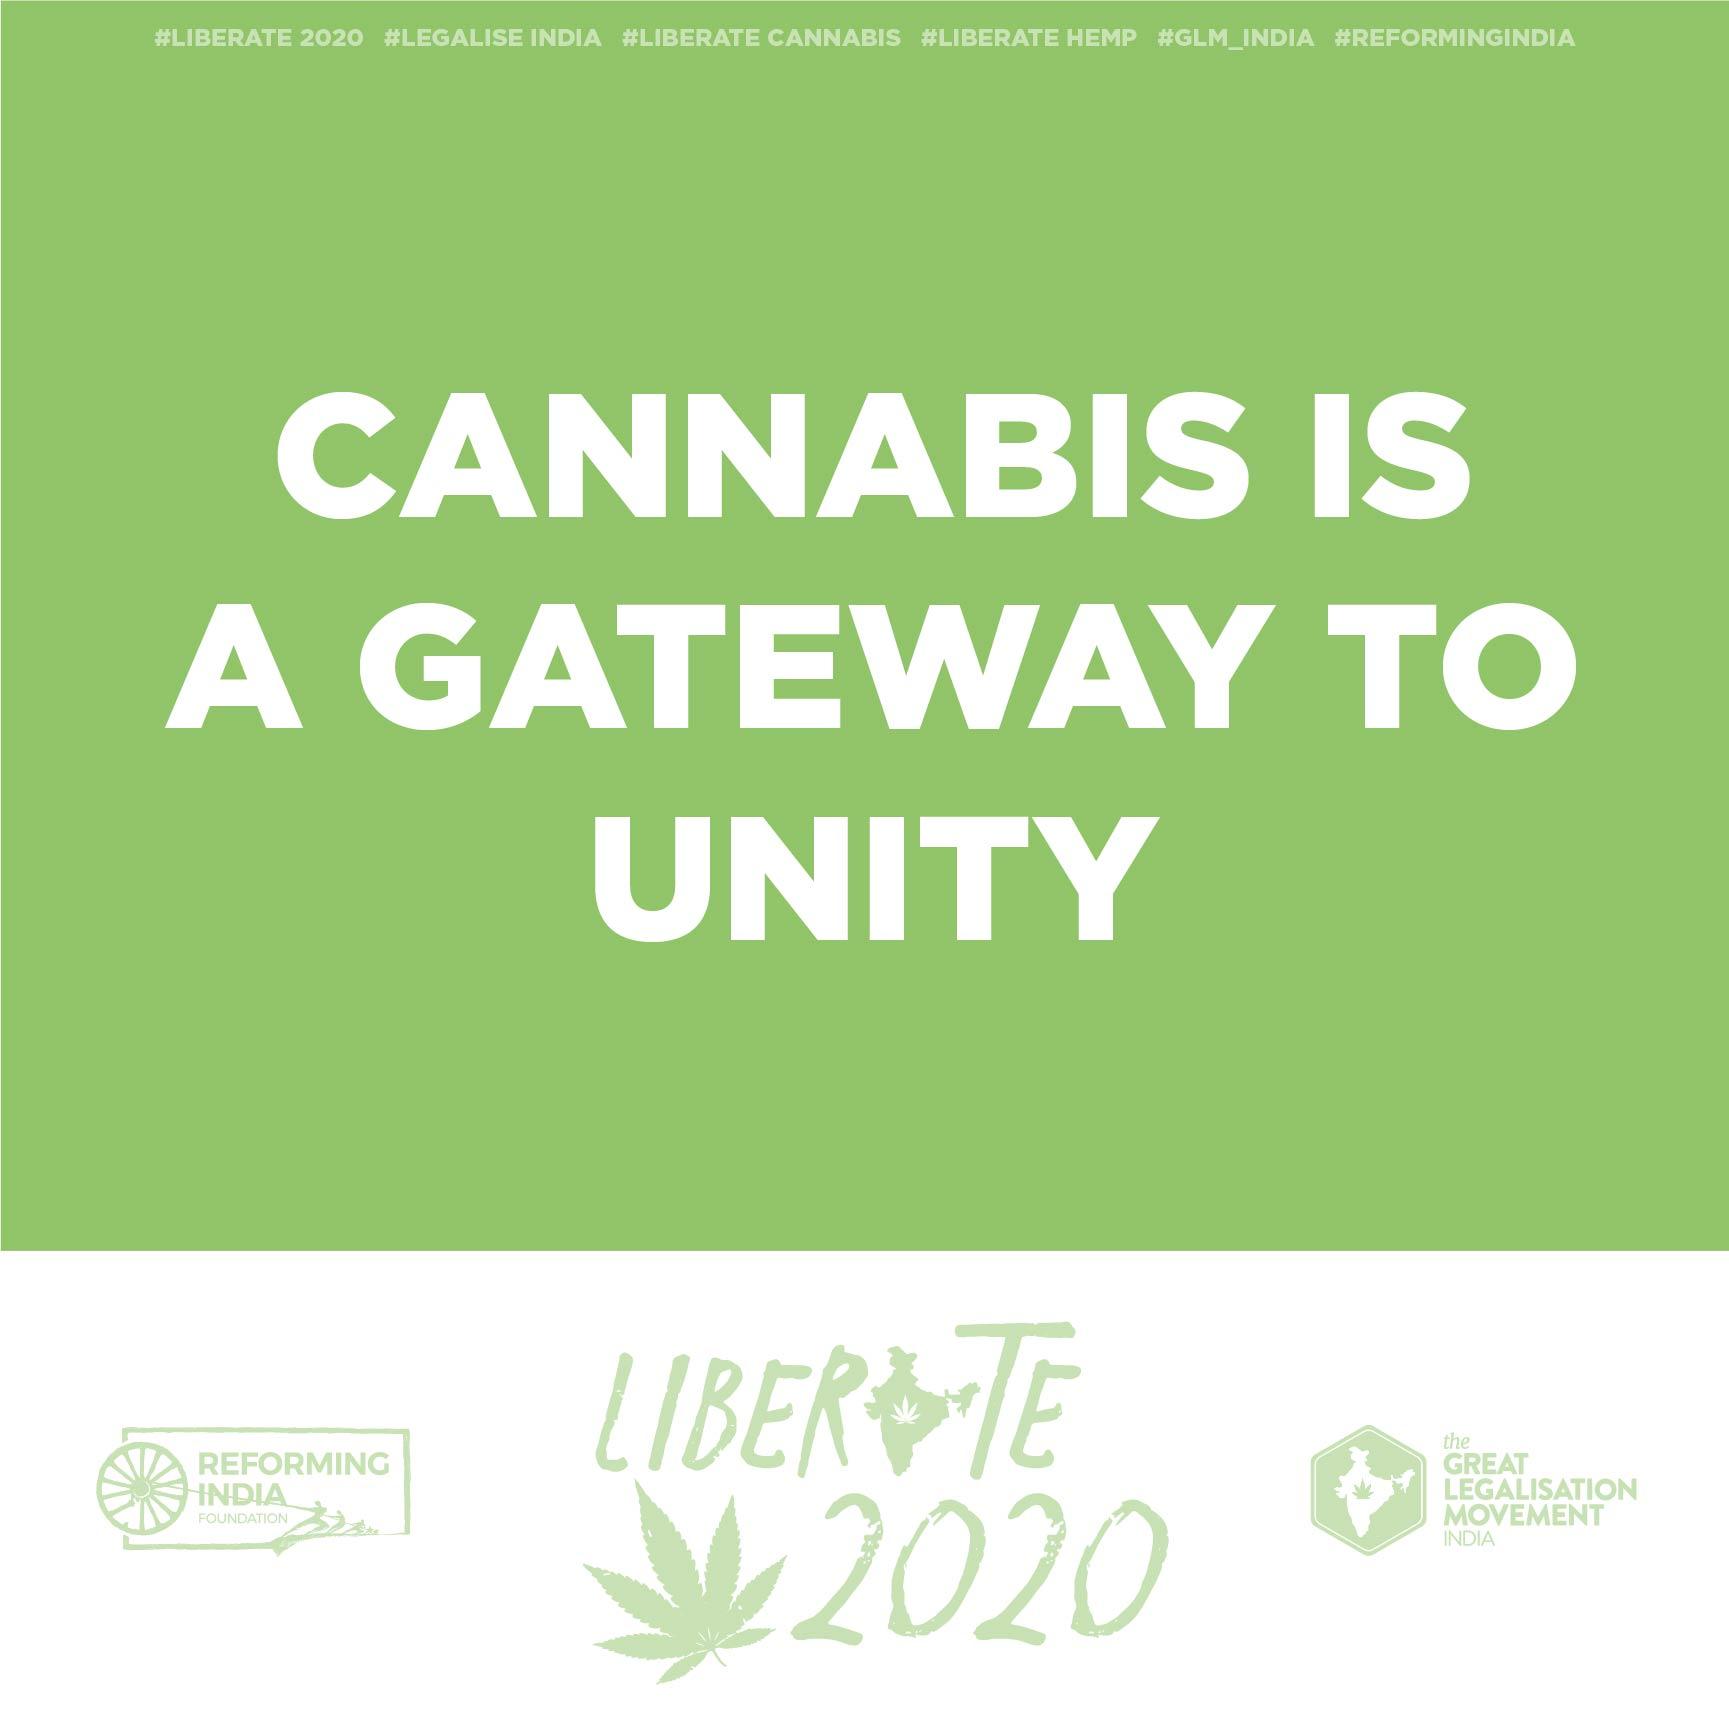 cannabisArtboard 1 copy 16-50.jpg